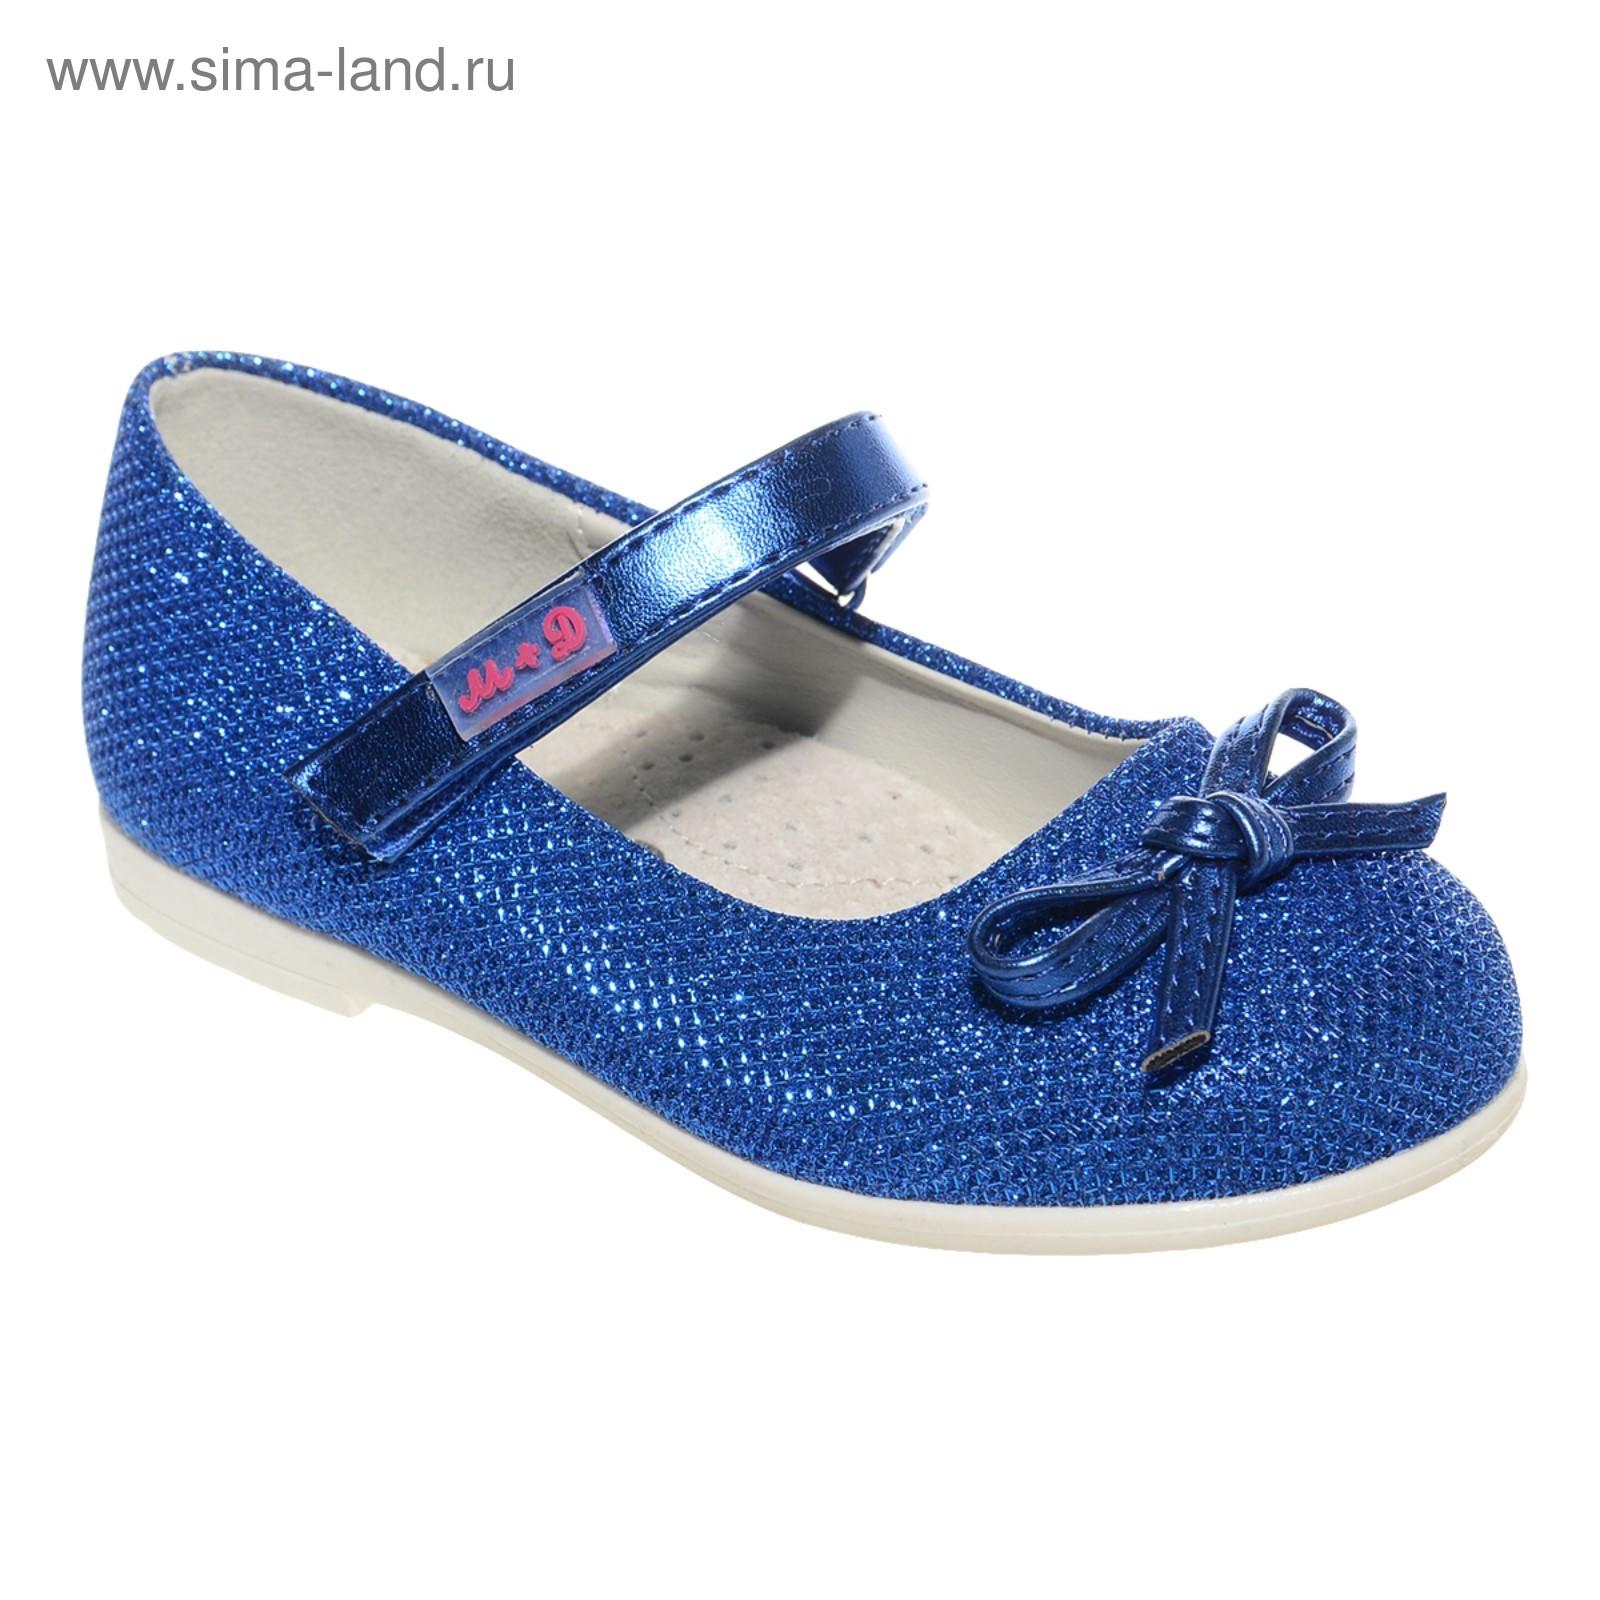 4151a72900aa Туфли для девочки, 12 пар в коробе 1717 2 (3595417) - Купить по цене ...